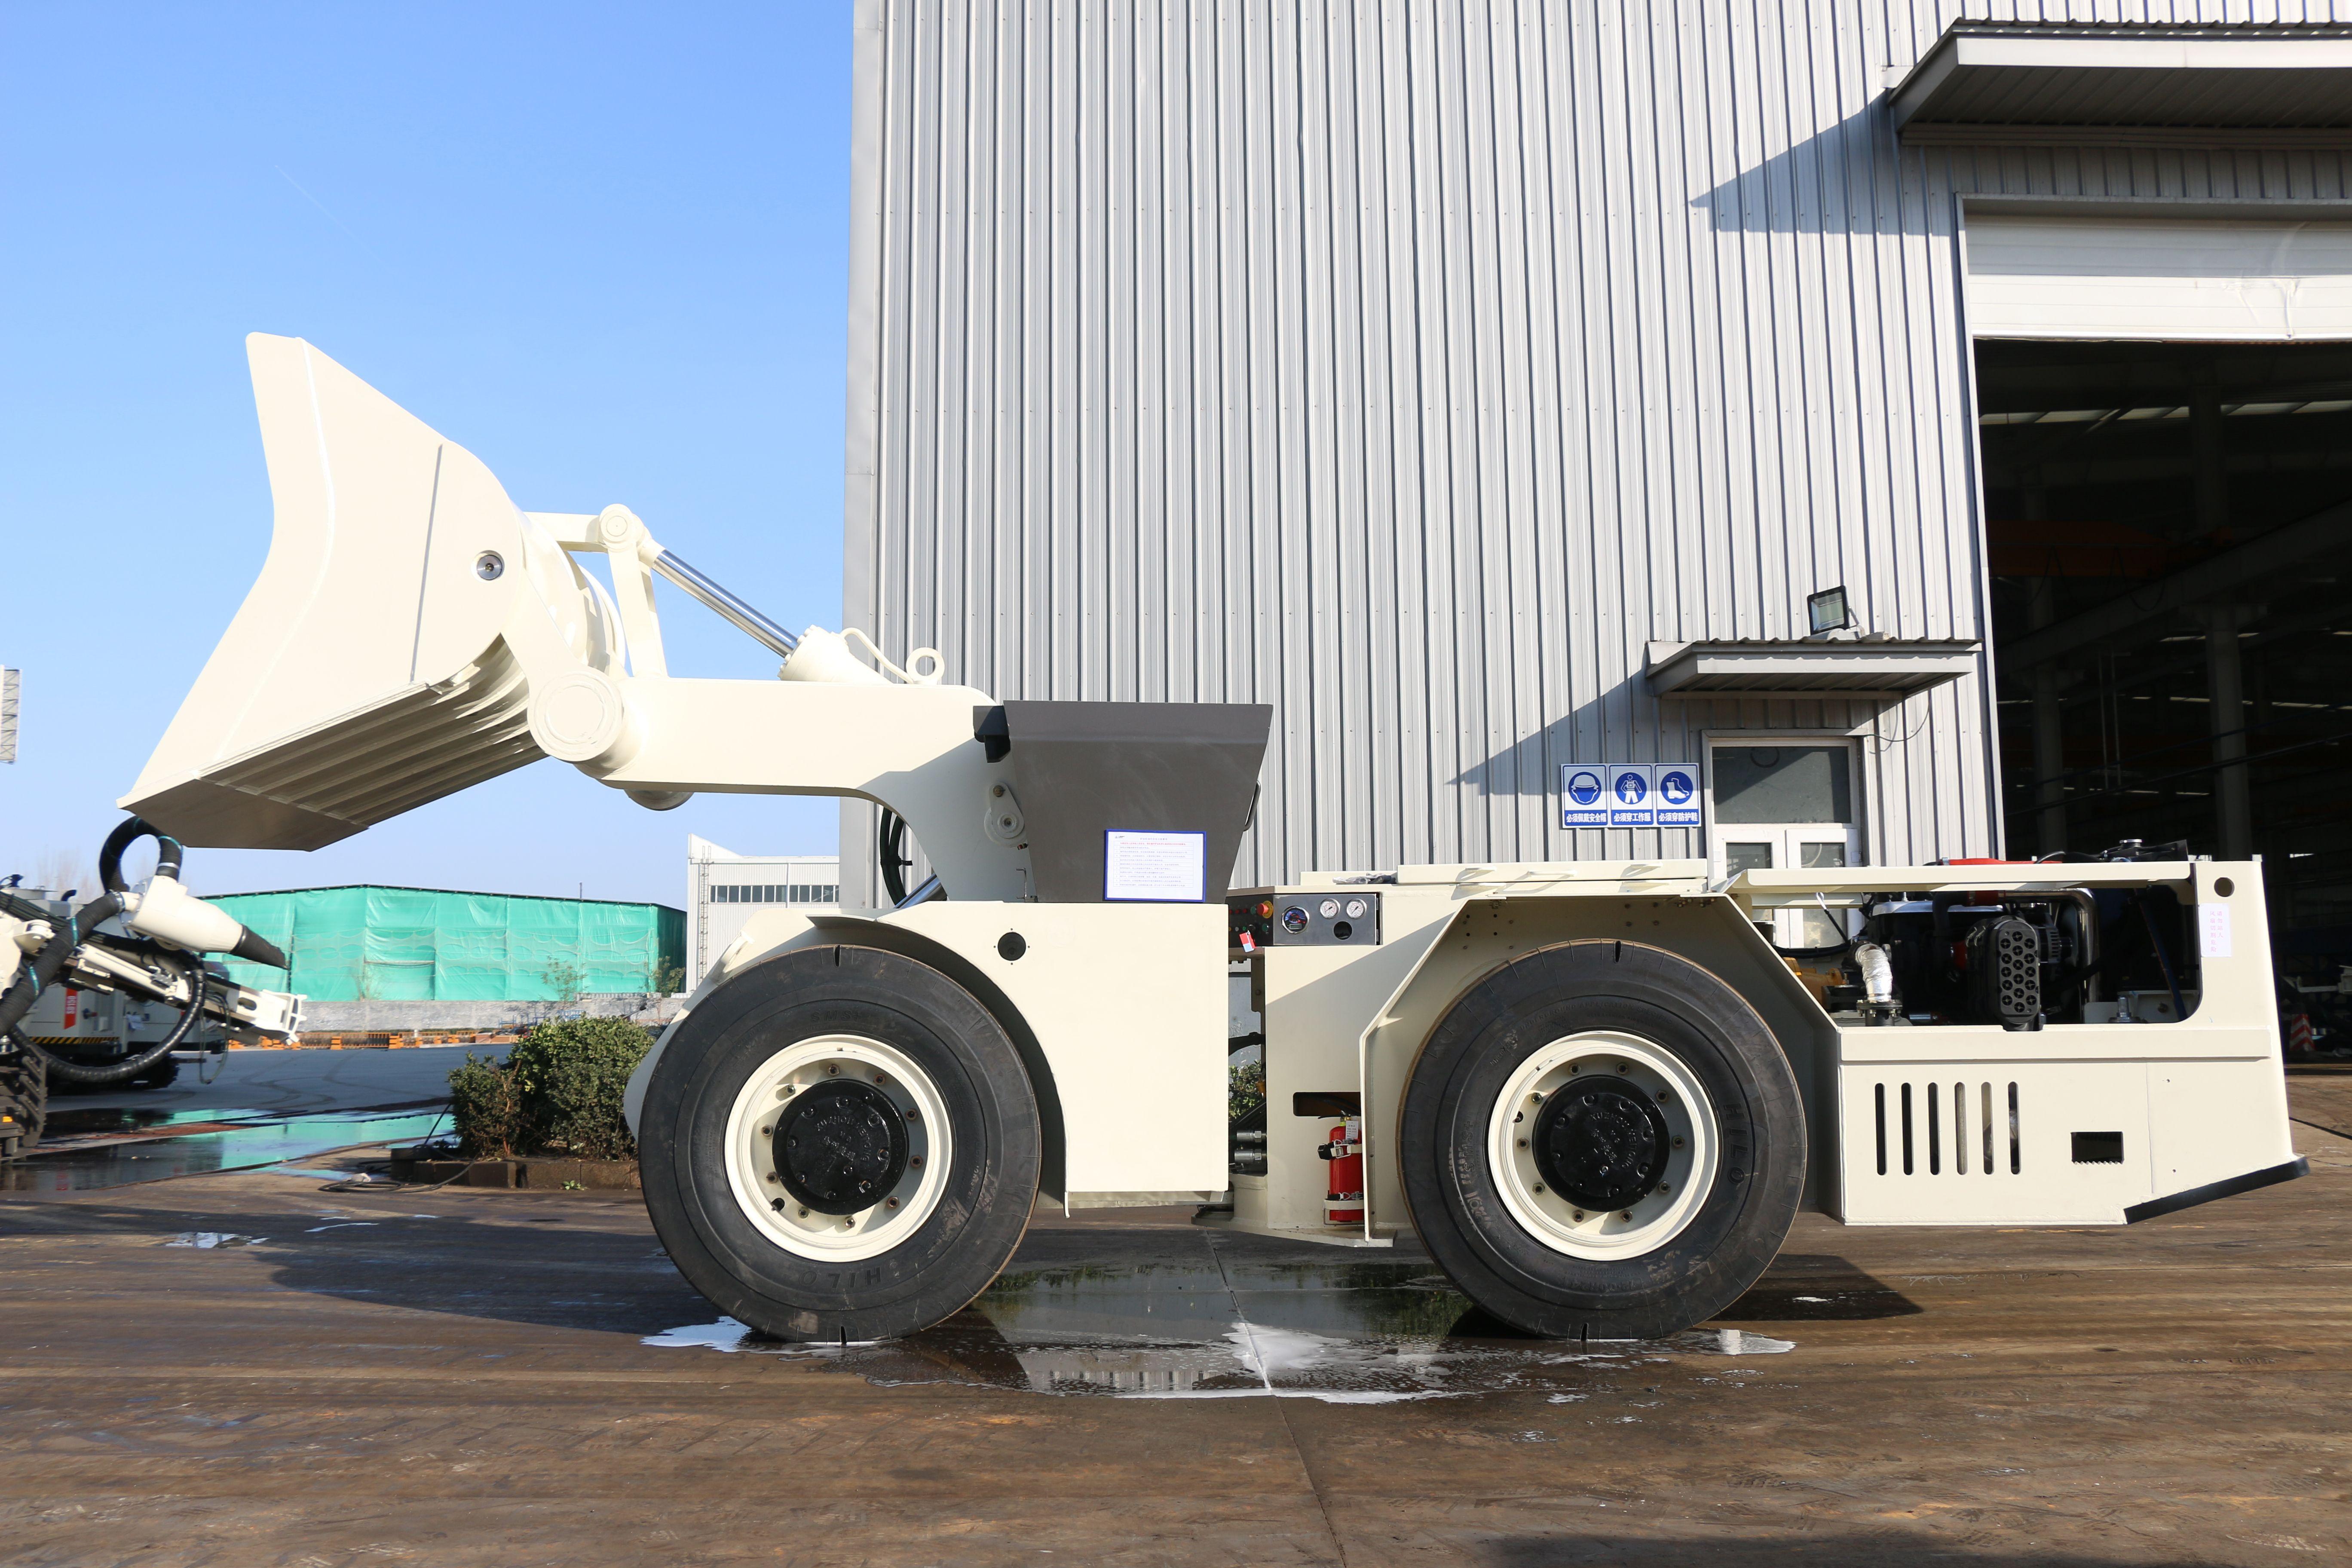 Standard Specification: UL20/UL40/UL50/UL70 Rated Load(kg